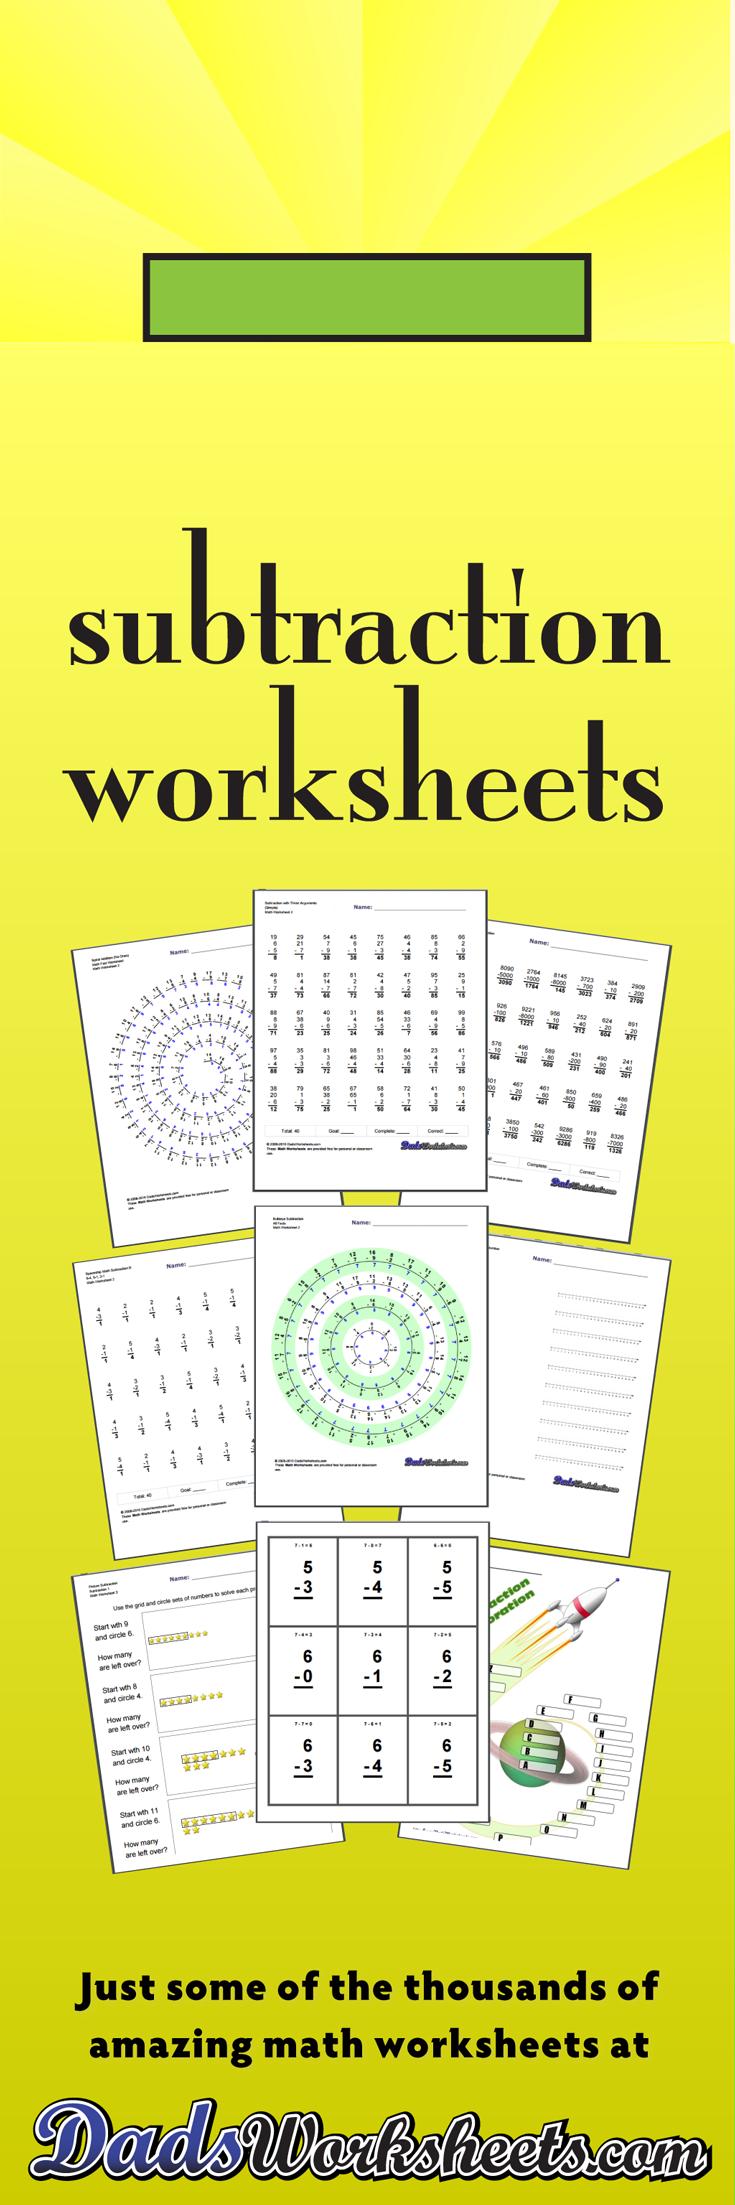 Subtraction Worksheets Subtraction Worksheets Subtraction Facts Worksheet Teaching Subtraction [ 2205 x 735 Pixel ]